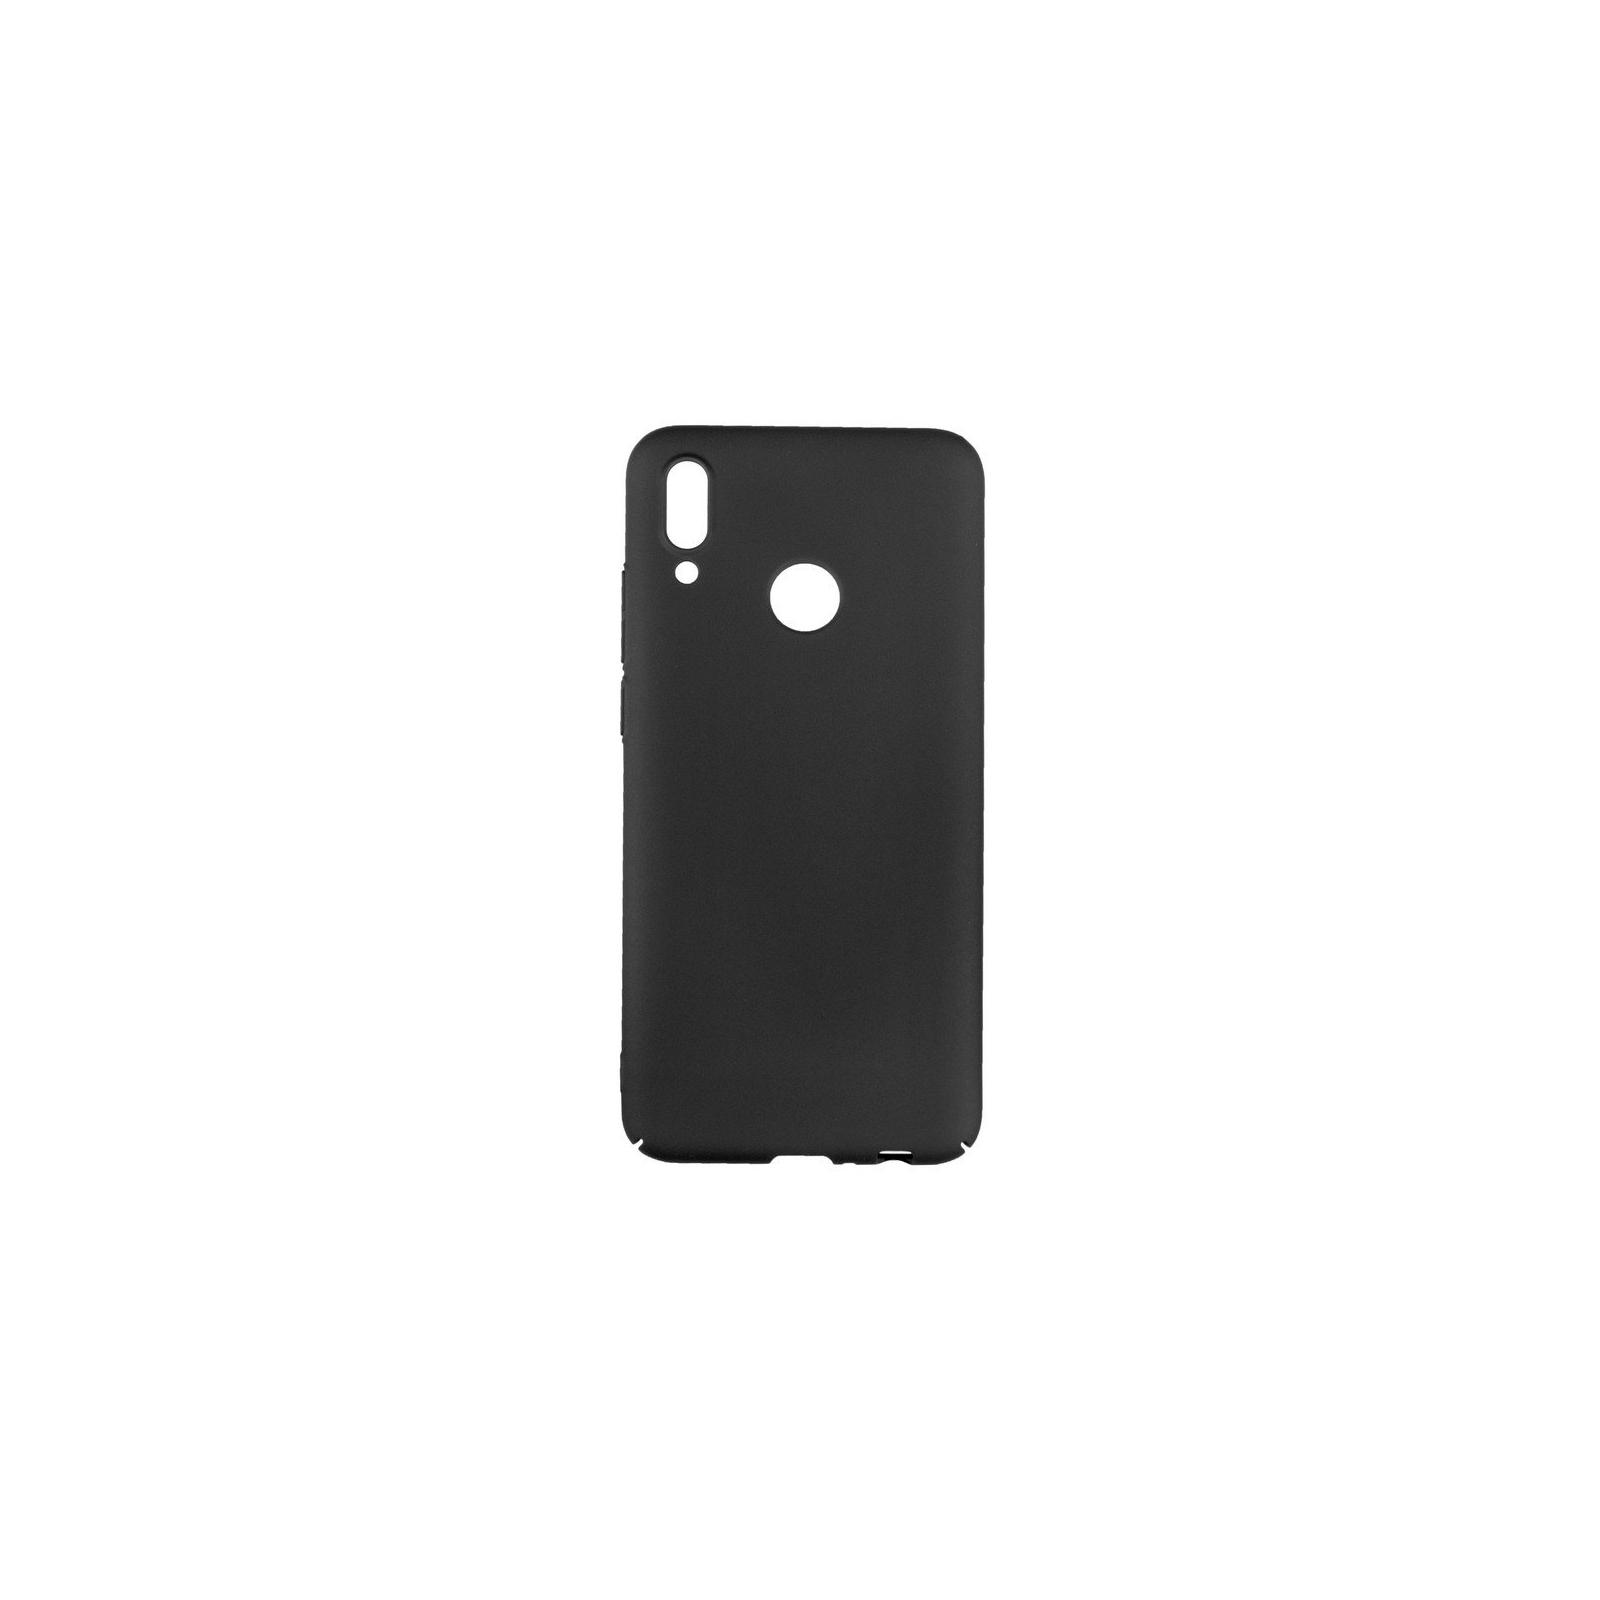 Чехол для моб. телефона ColorWay ColorWay PC case для Huawei P Smart (2019)/ Honor 10 lite Bl (CW-CPLHPS19-BK)